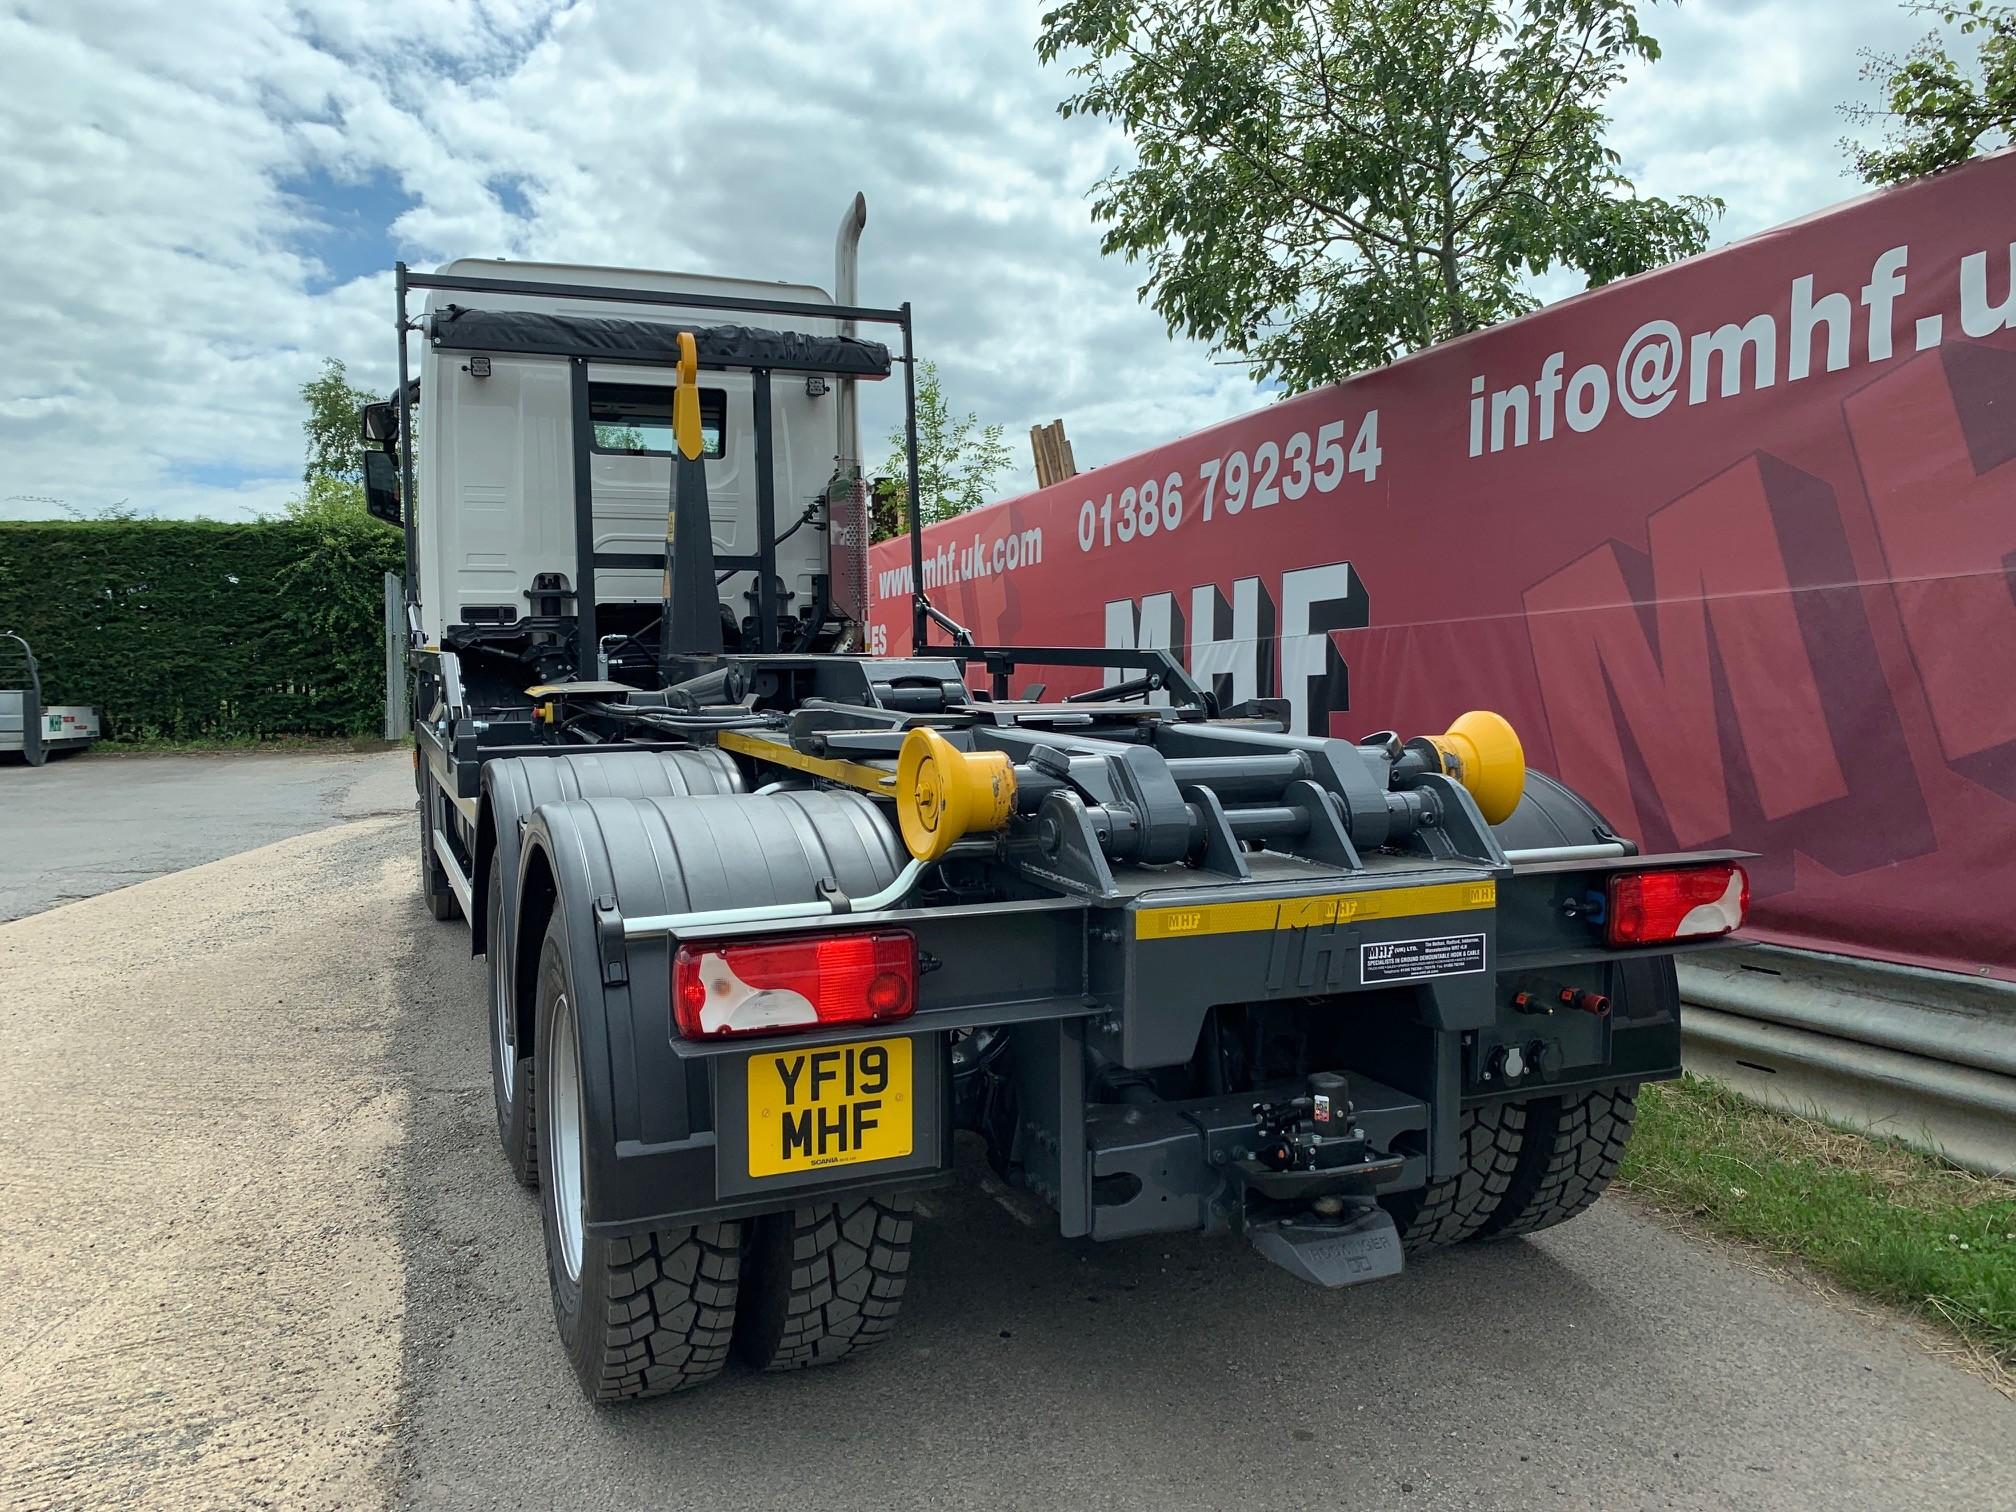 YF19 MHF 2019 6×4 Scania 26,000kgs Hookloader – MHF